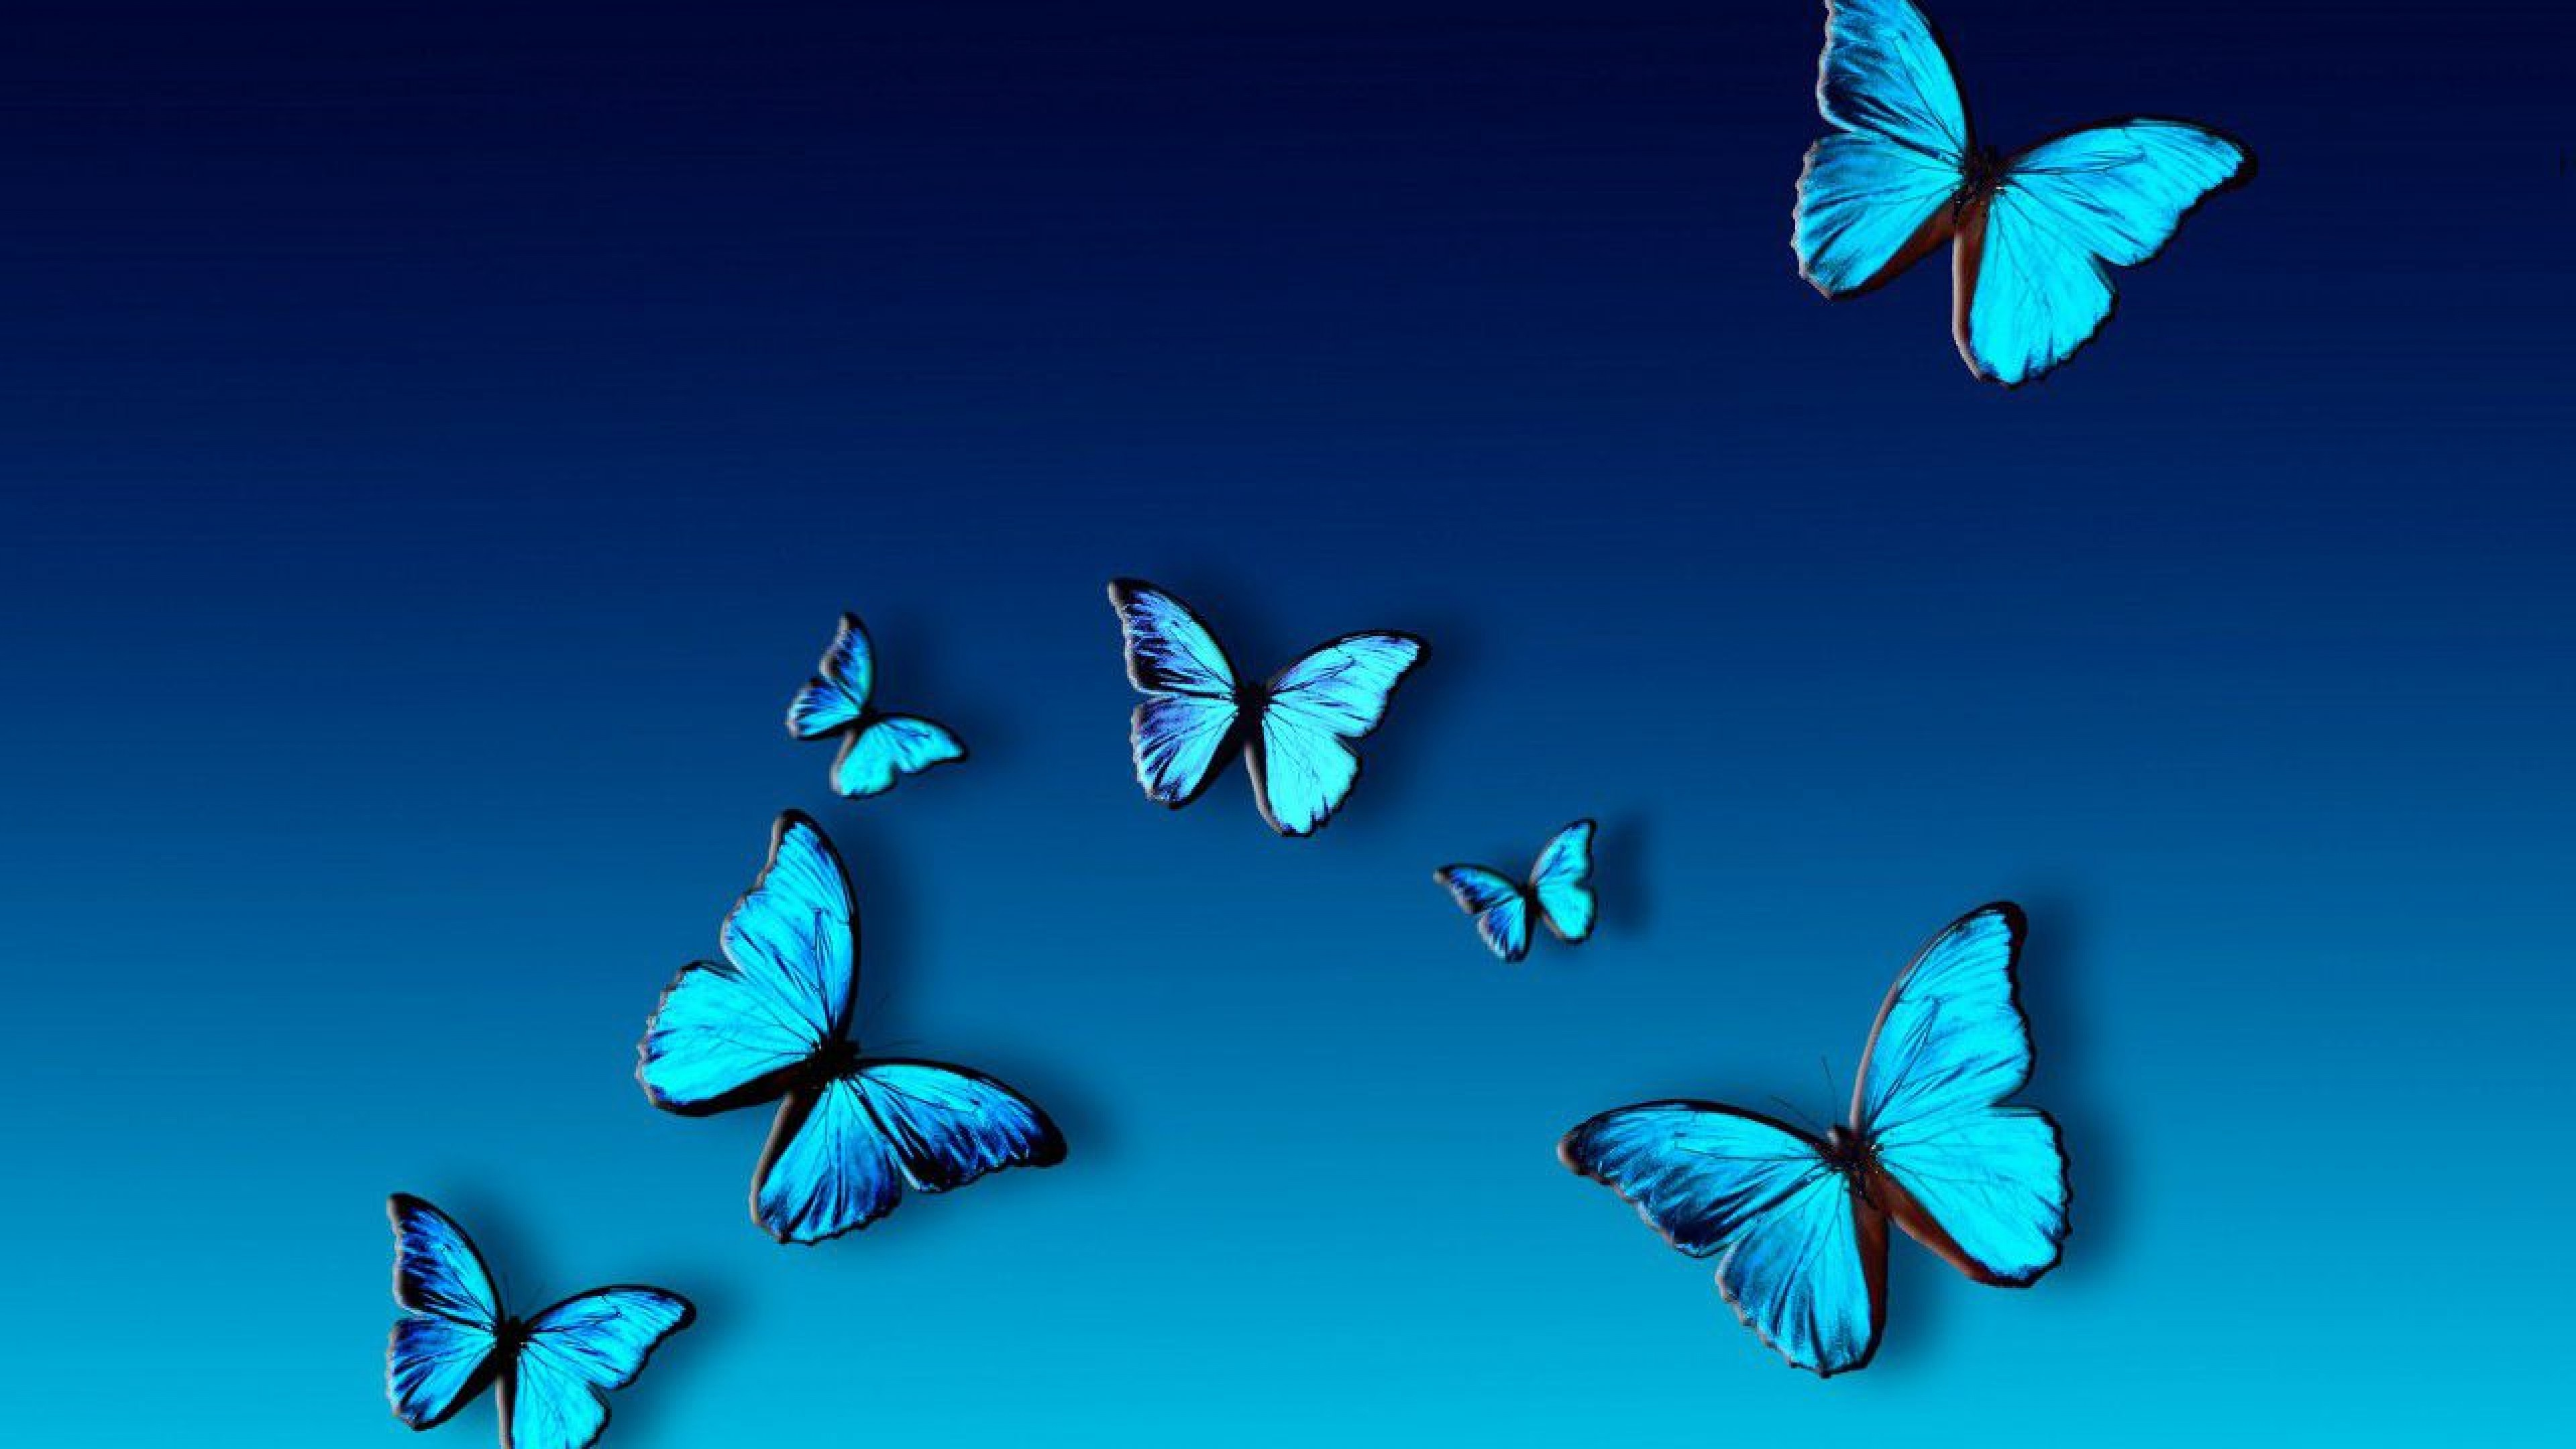 Blue Butterfly Wallpaper - Blue Butterfly Wallpaper Hd , HD Wallpaper & Backgrounds